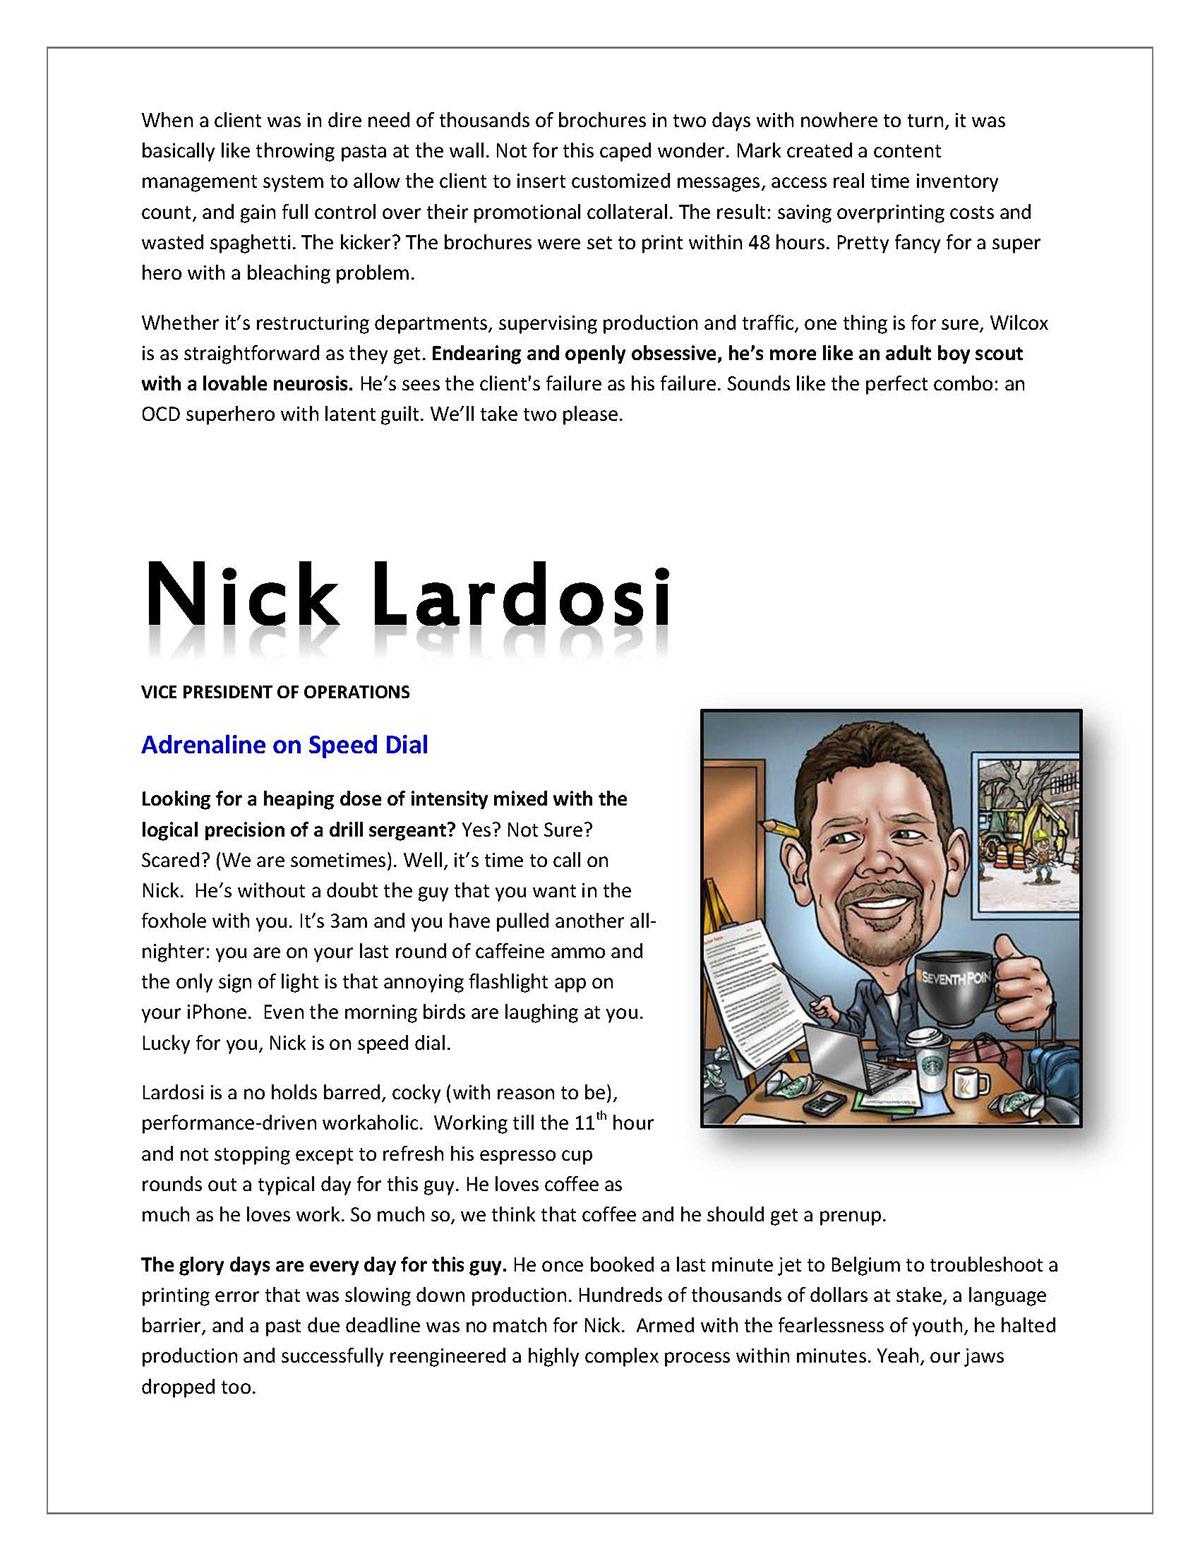 comedic Humorous writing comedian biographies humor comedic writing humorous copy corporate biography Executive Profile Branding Strategy funny biography